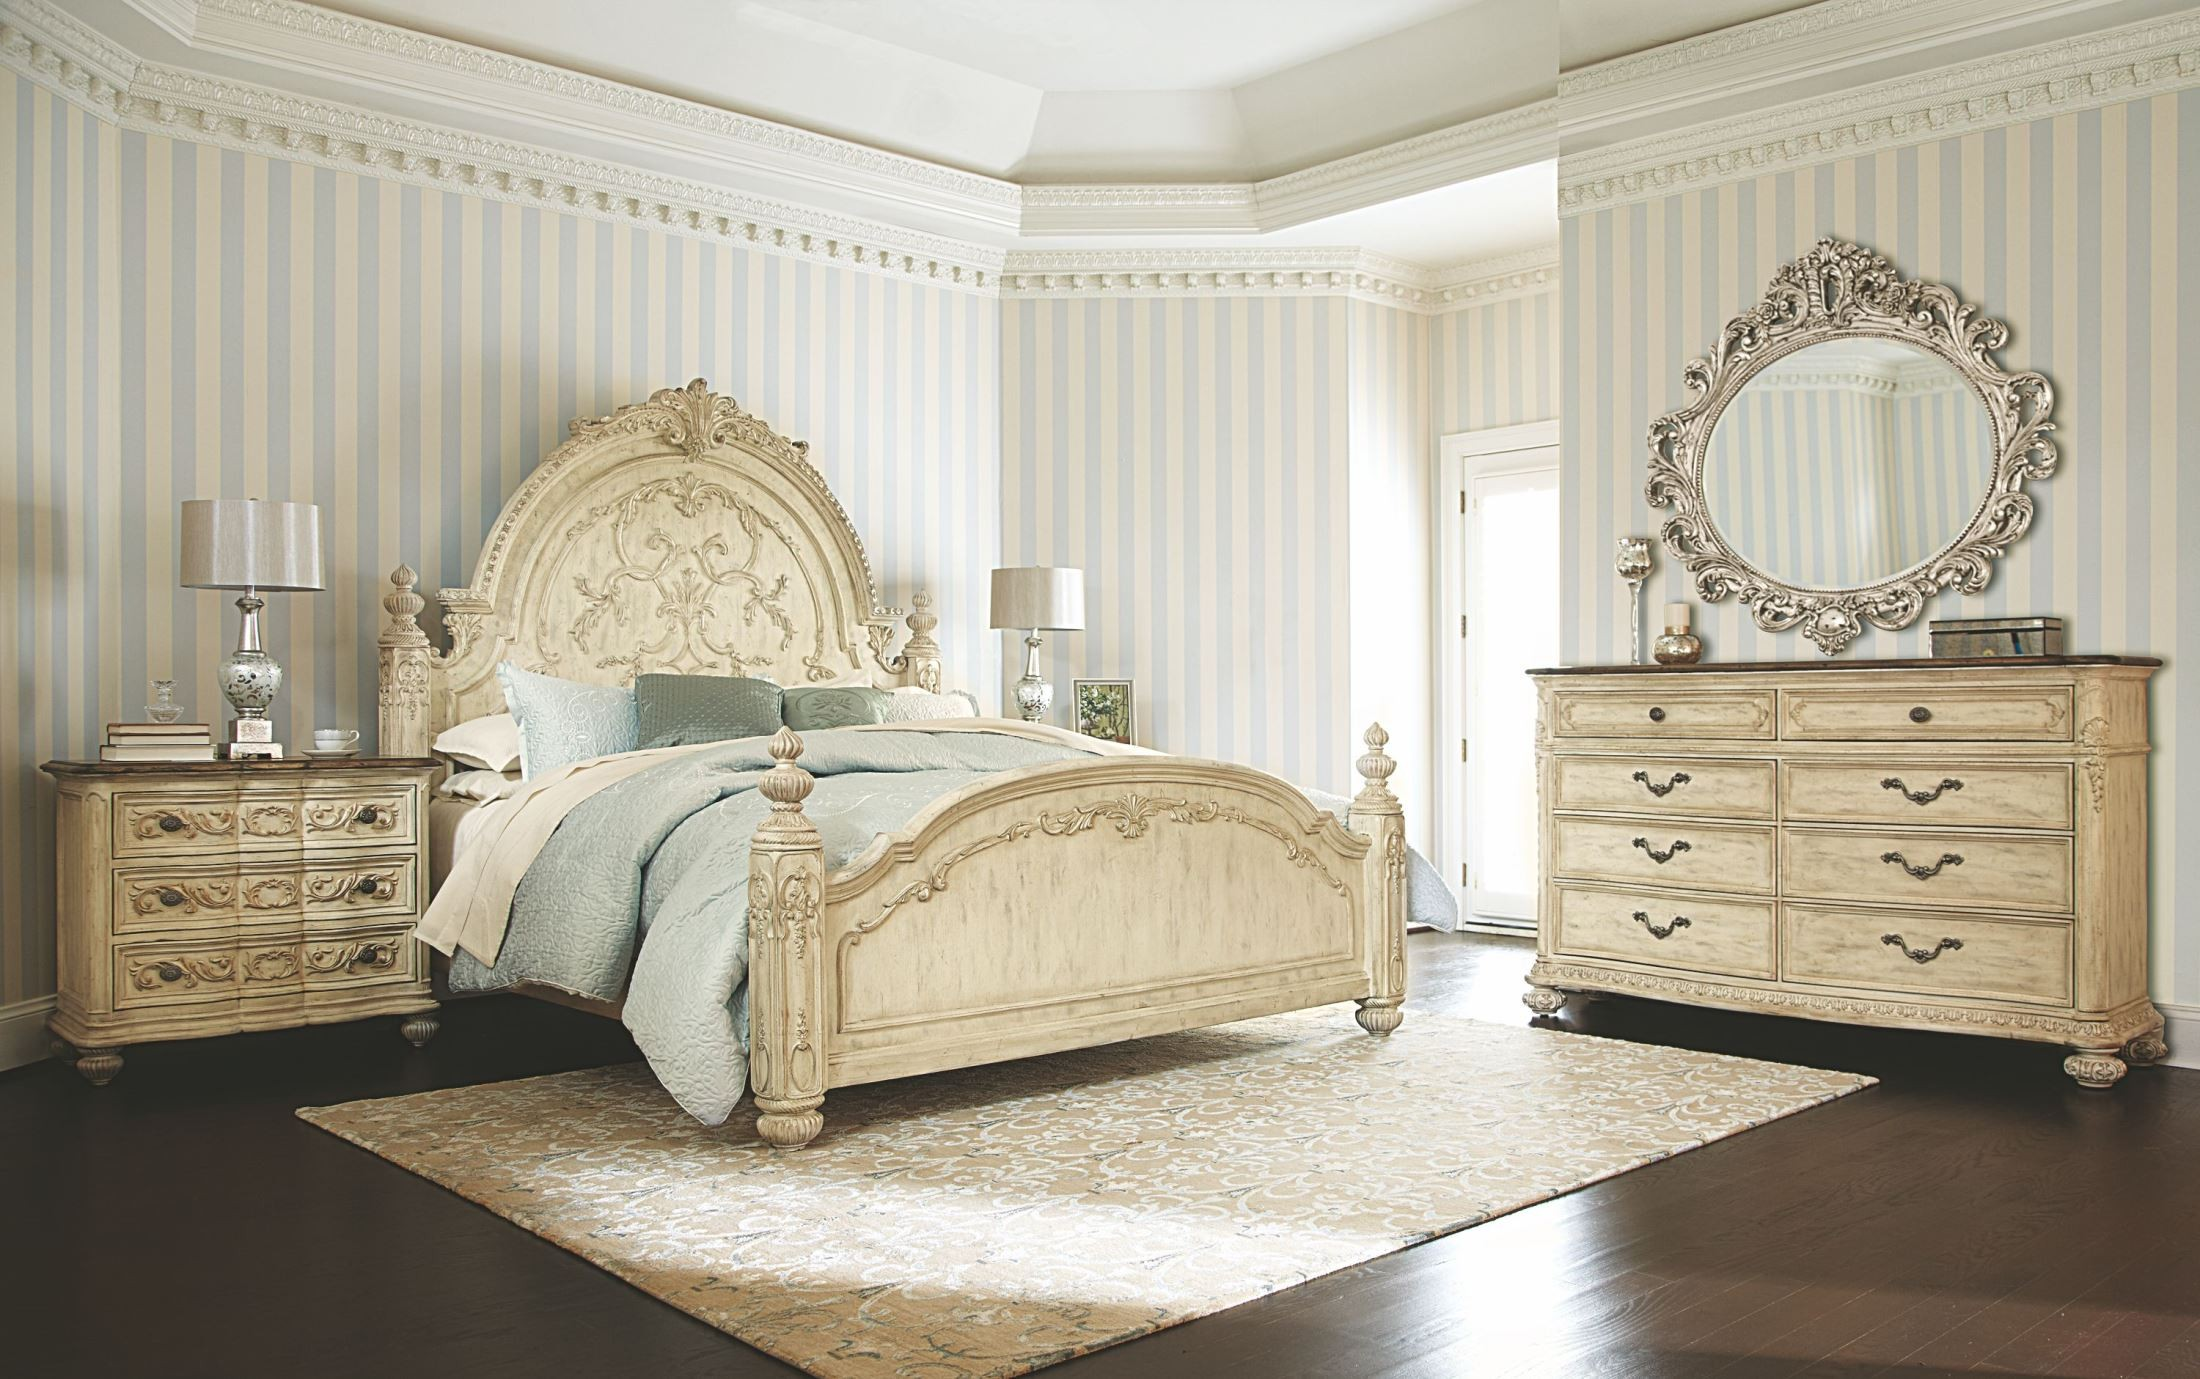 Jessica Mcclintock Boutique White Veil King Mansion Bed